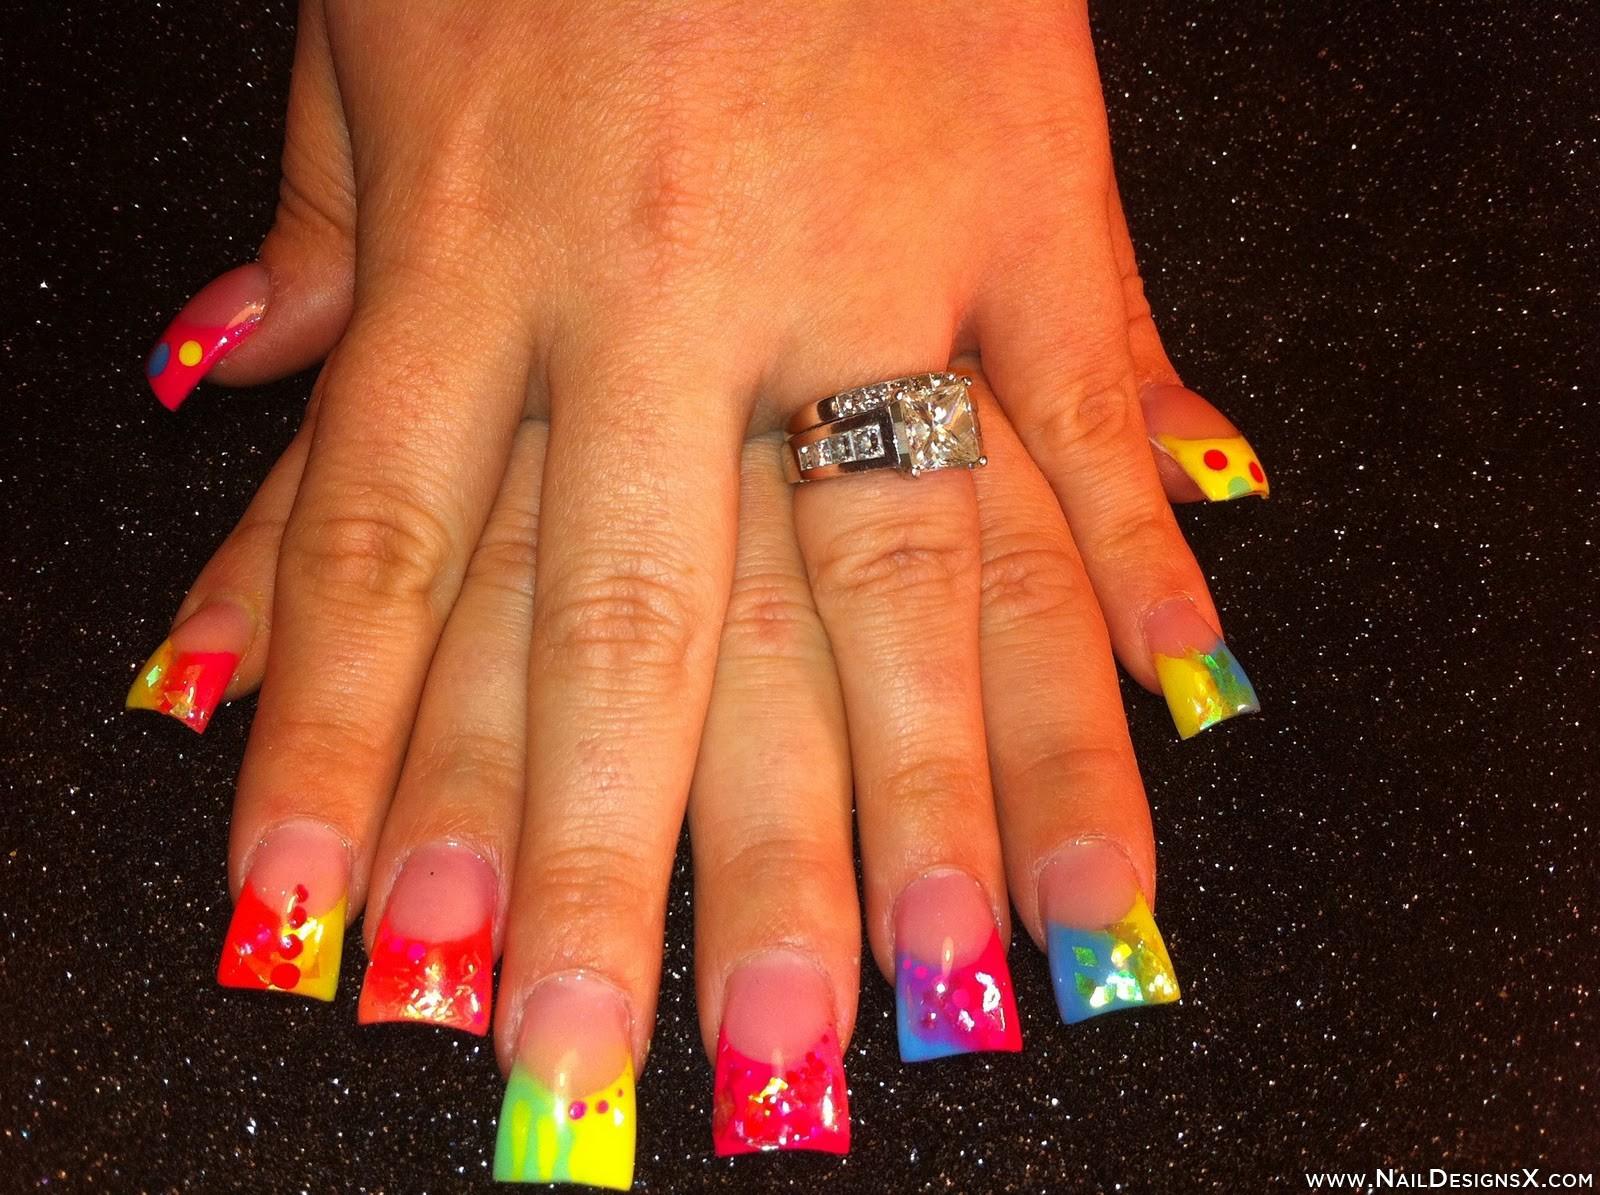 17 Neon Acrylic Nail Designs Ideas Images - Neon Nail Art Designs ...